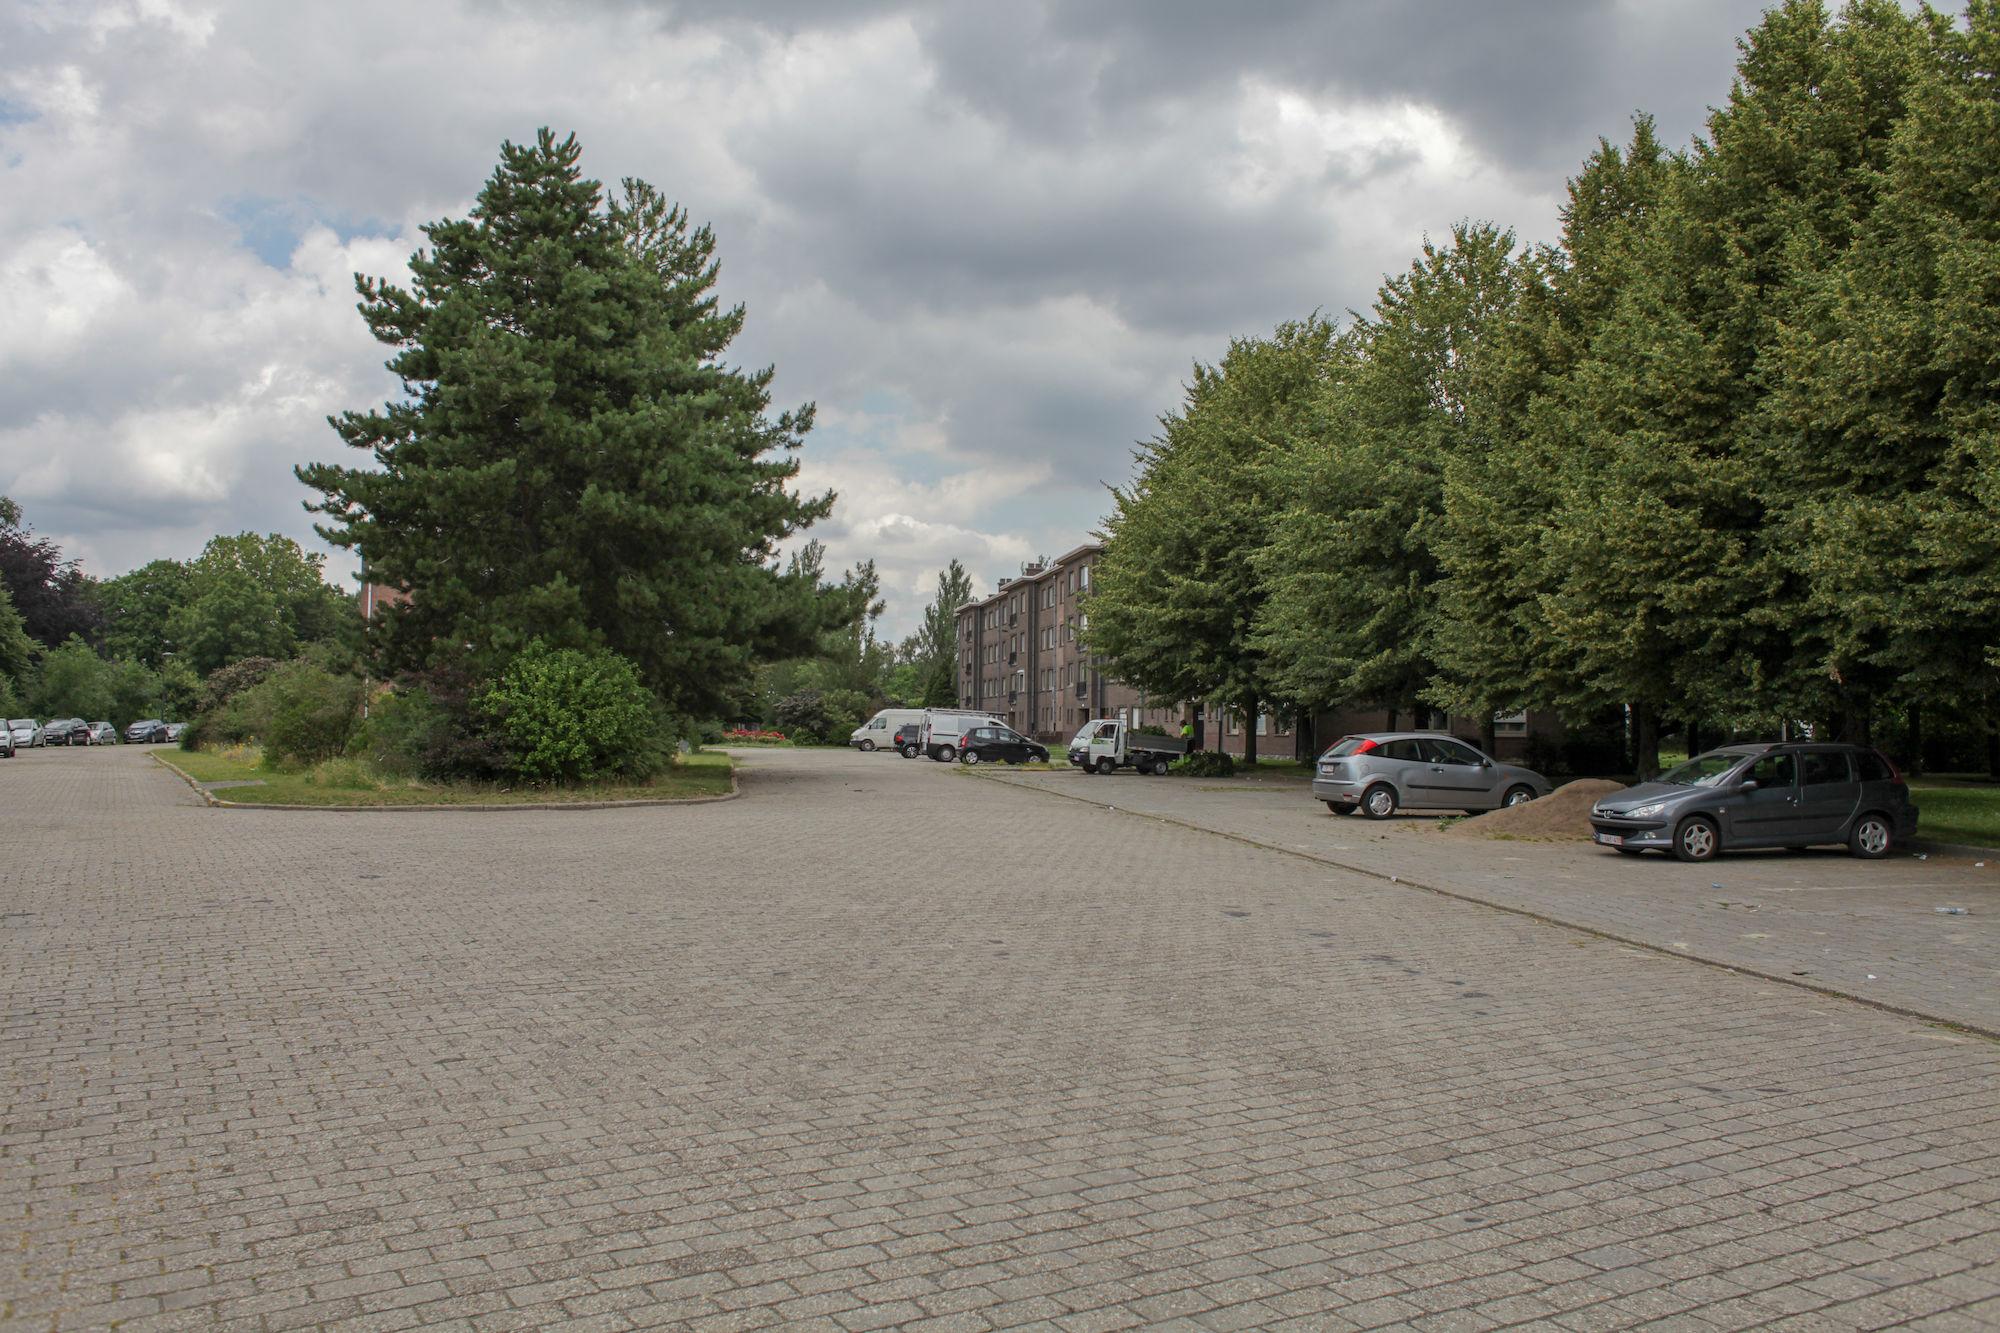 2019-07-02 Muide Meulestede prospectie Wannes_stadsvernieuwing_IMG_0344-3.jpg